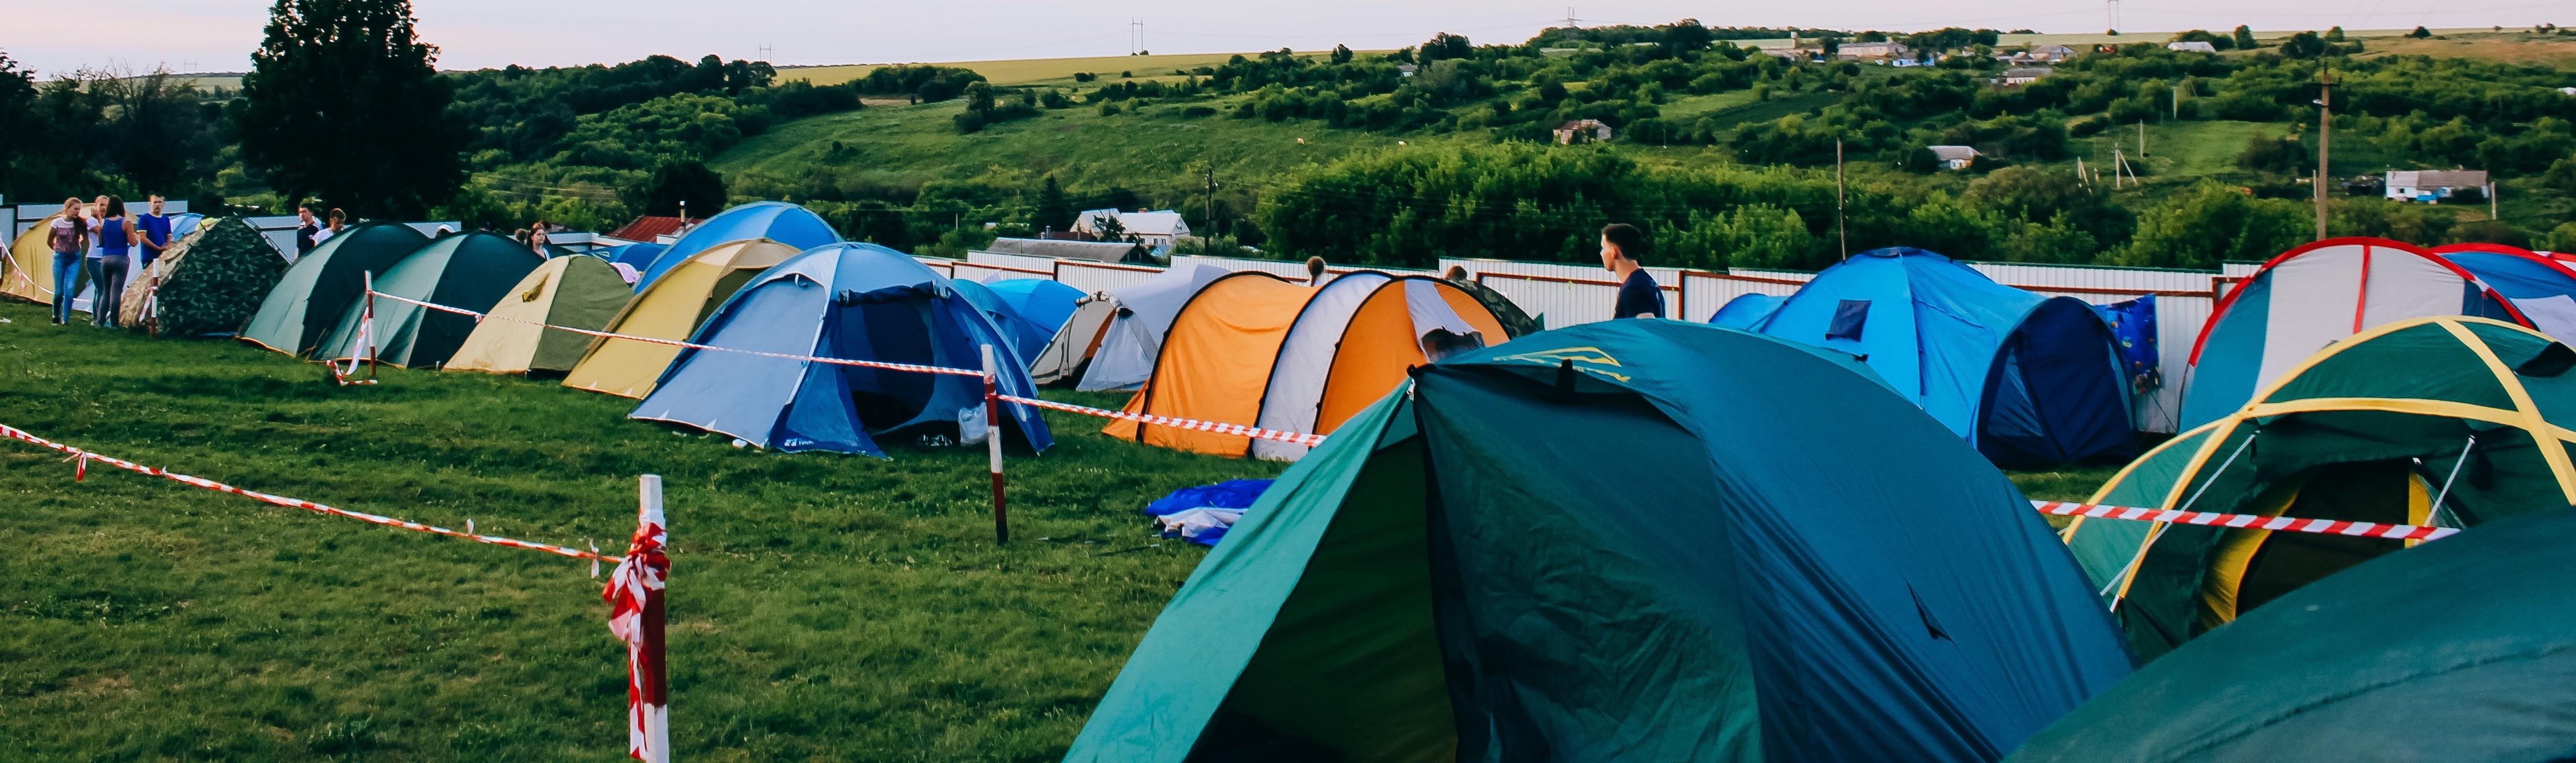 SS17 | Festival Camping Checklist